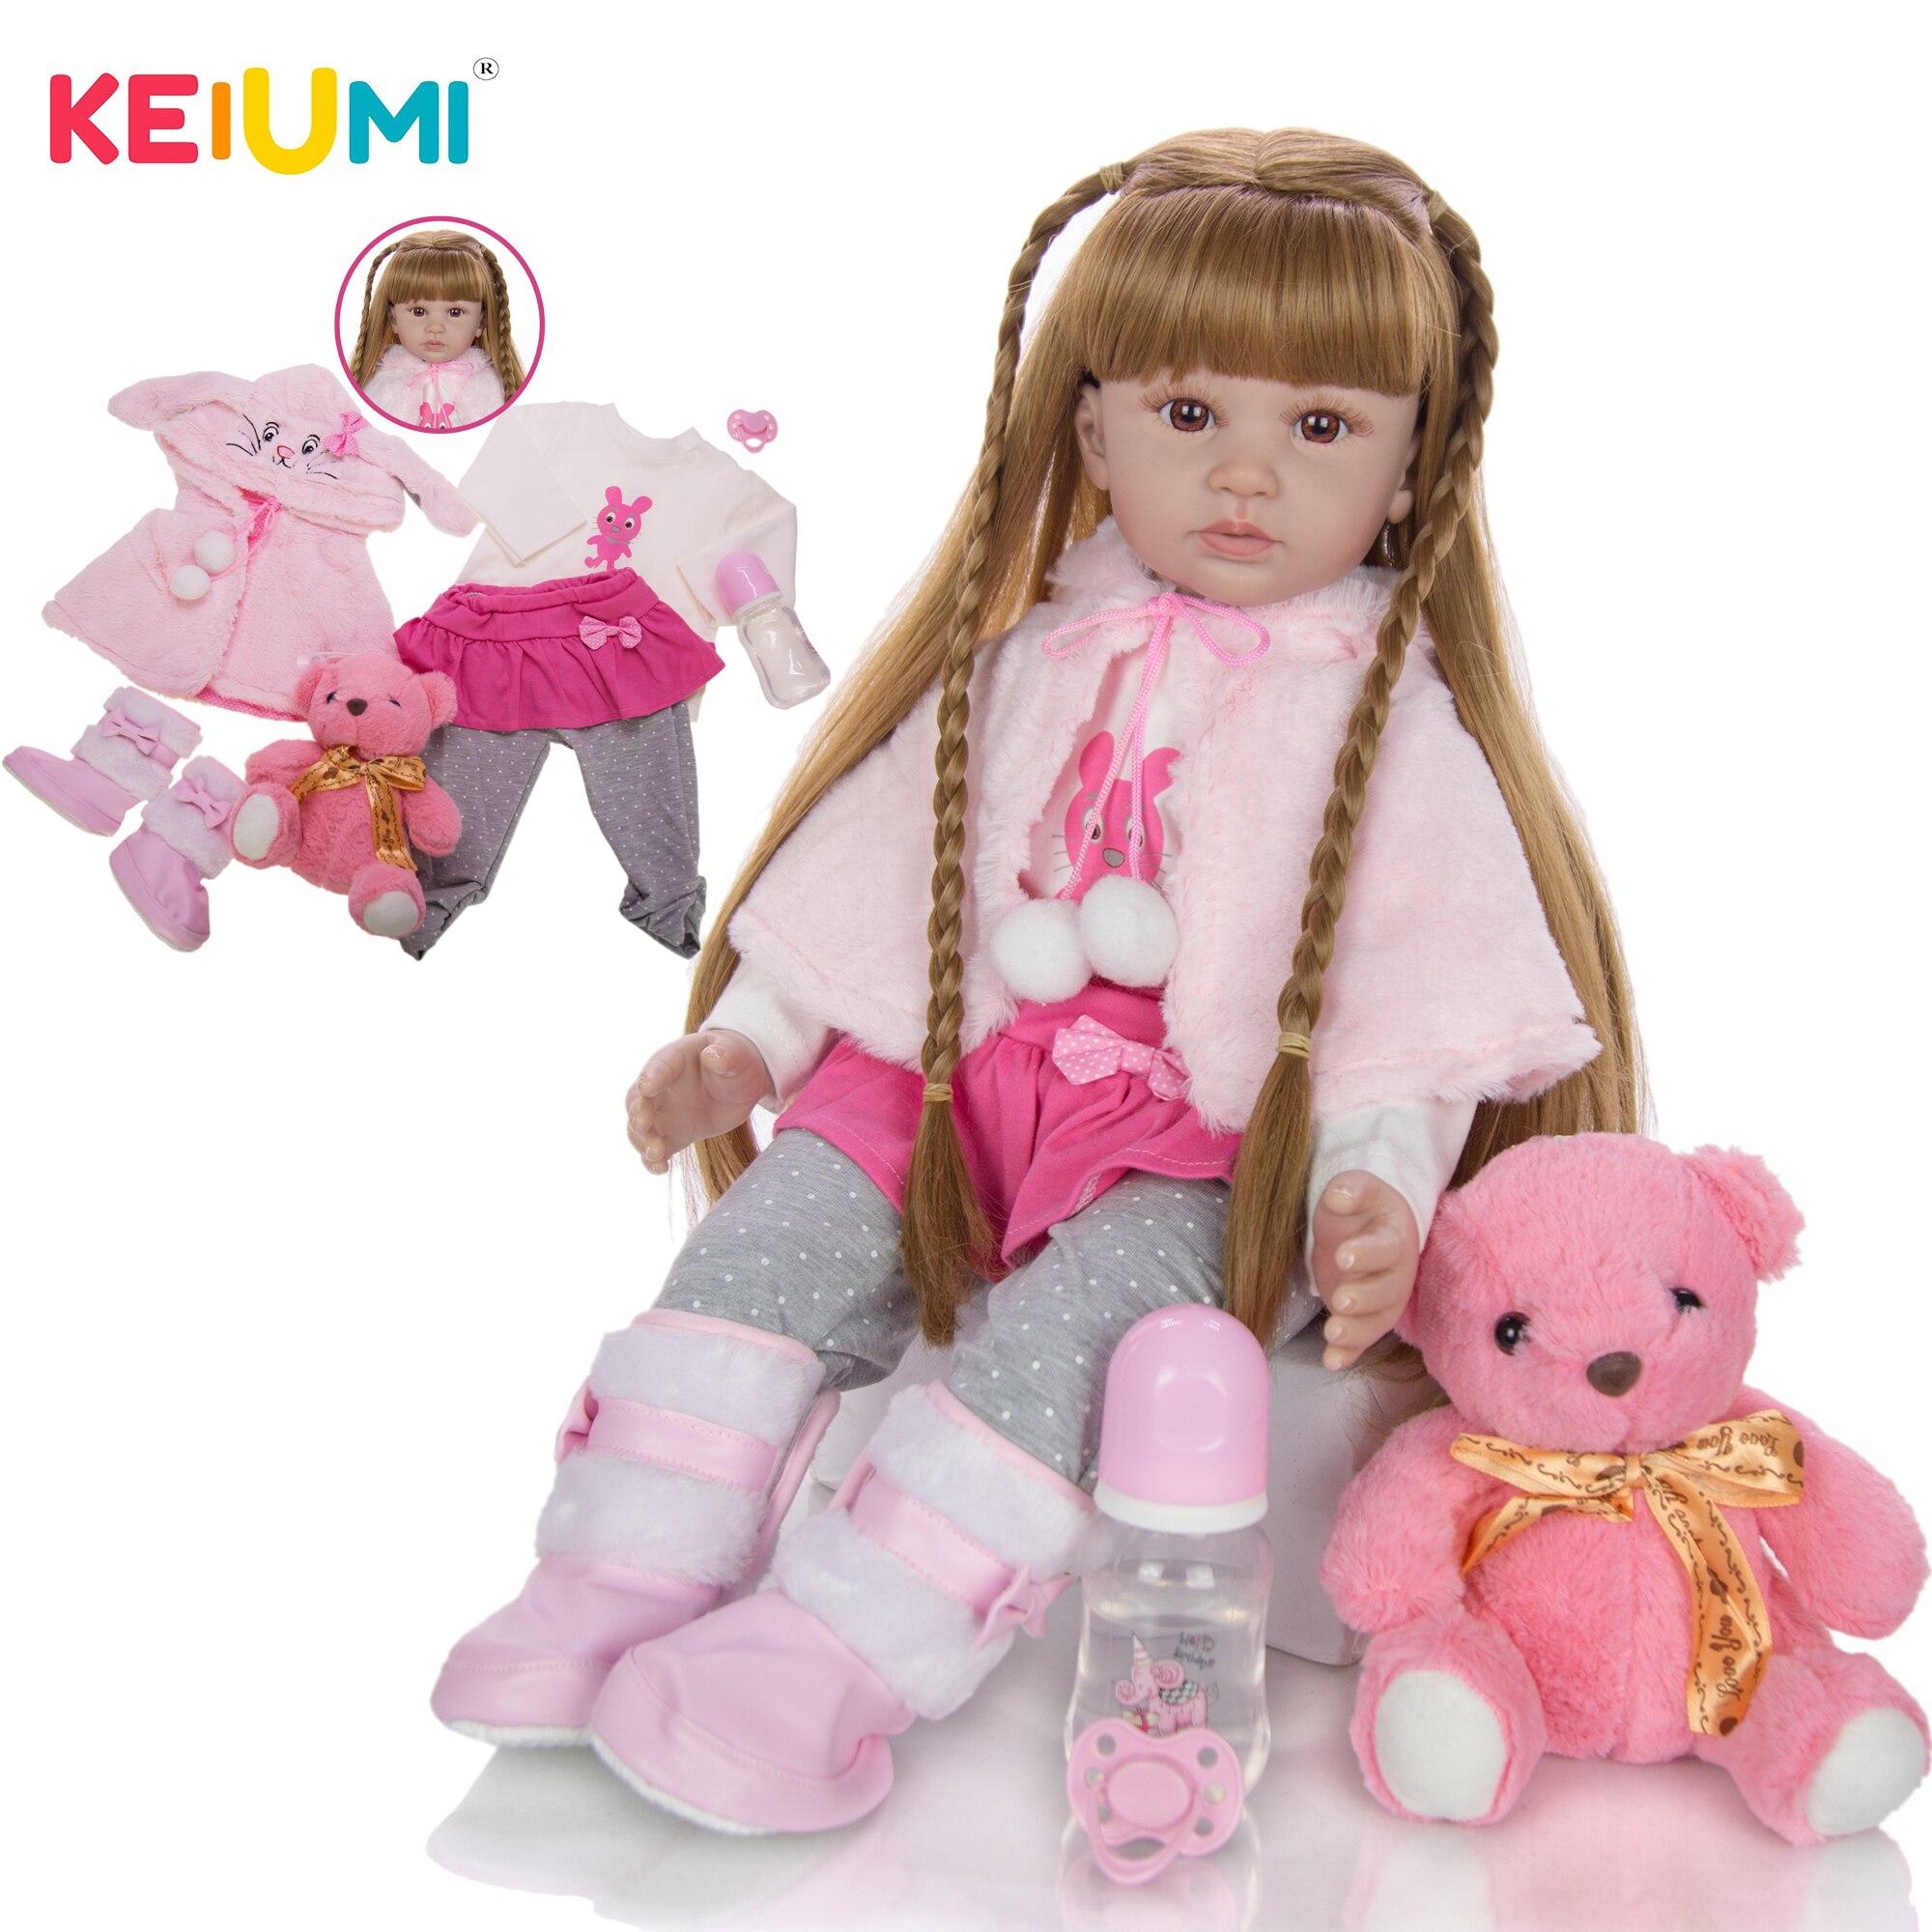 Fashion Real Cloth Body Baby Reborn Girl Doll 60 cm Lifelike Reborn Baby Dolls Toy Newborn Toddler Educational Gifts Dropship